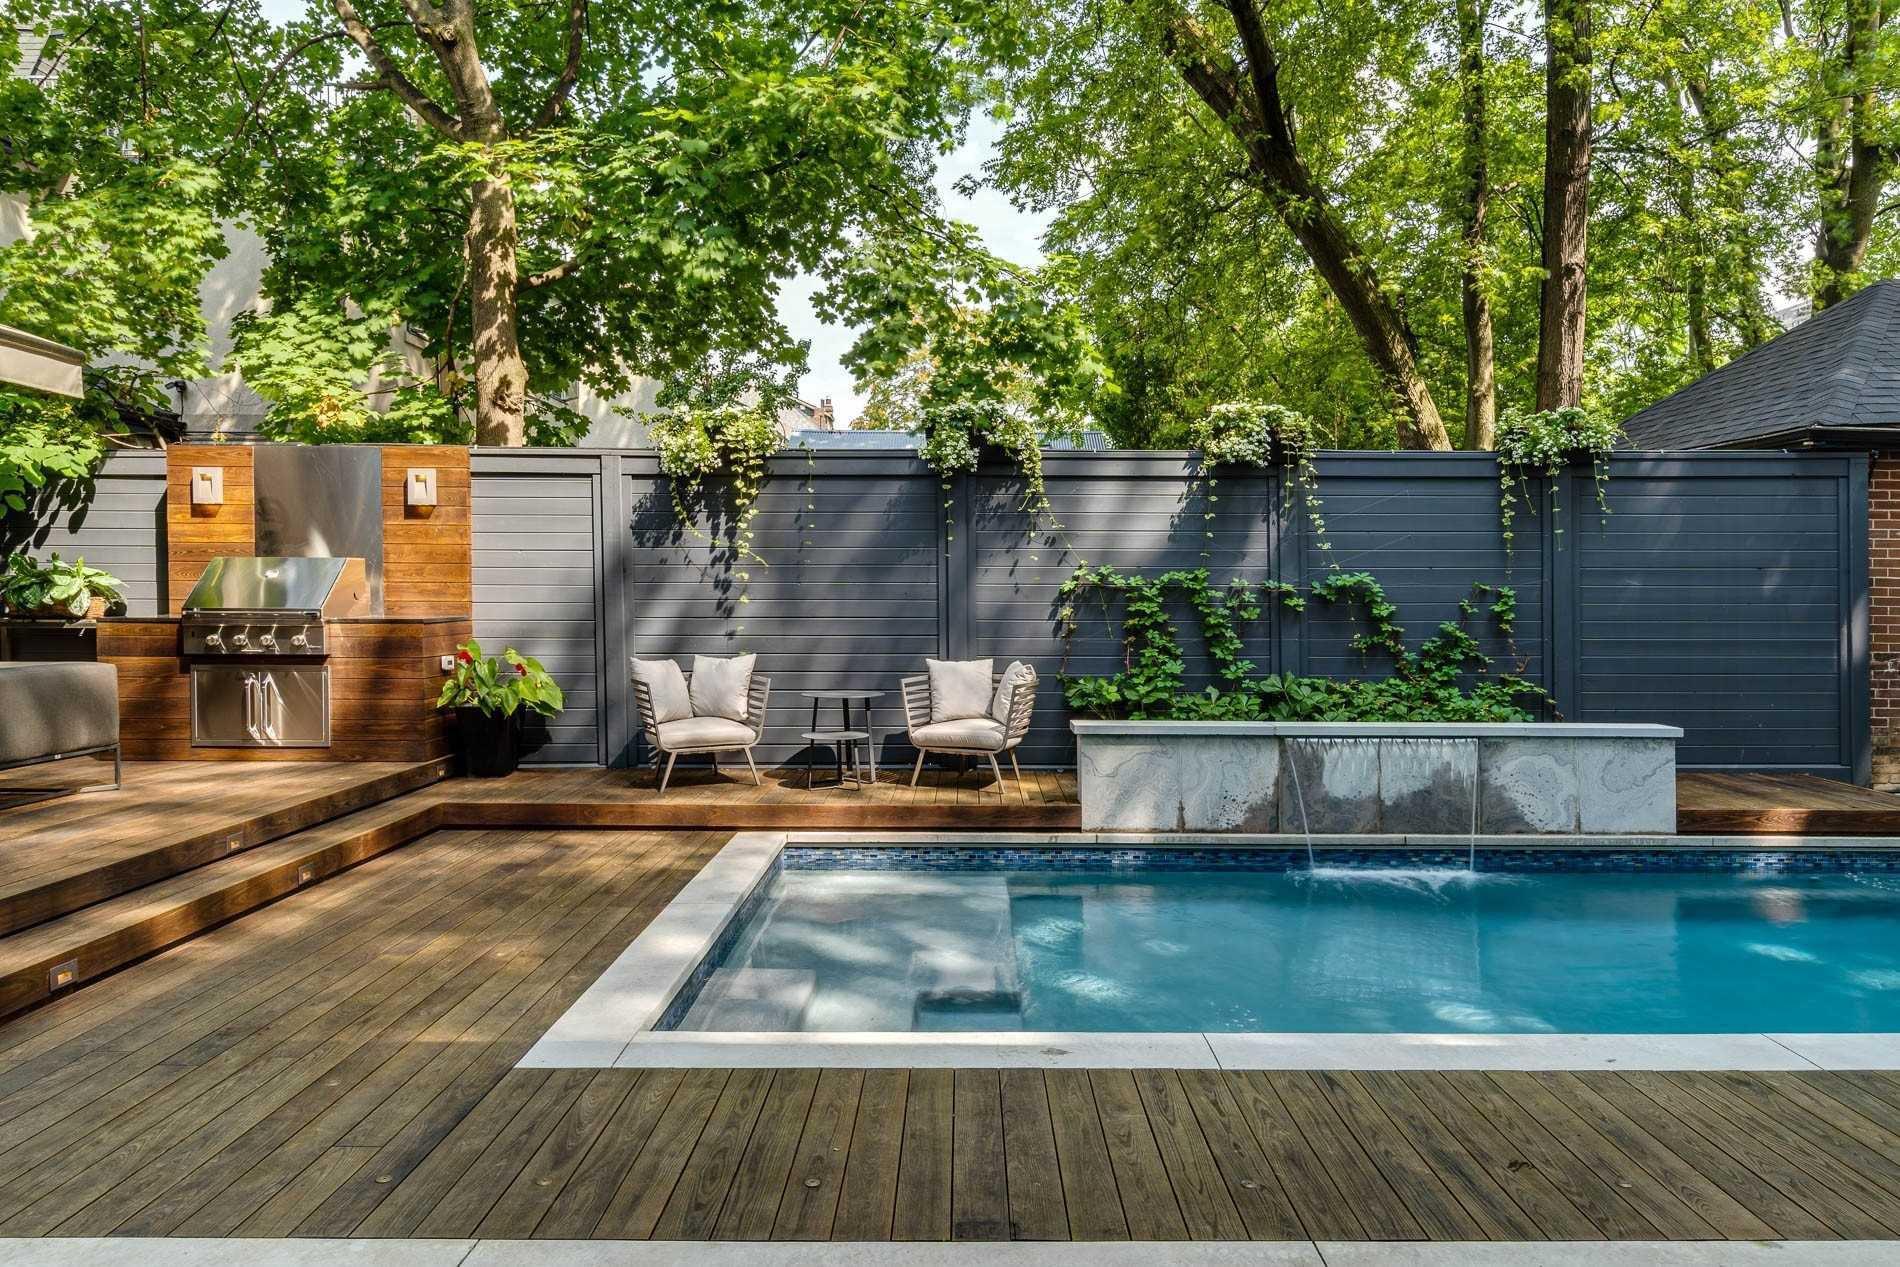 Photo 10: Photos: 45 Admiral Road in Toronto: Annex House (3-Storey) for sale (Toronto C02)  : MLS®# C4612730